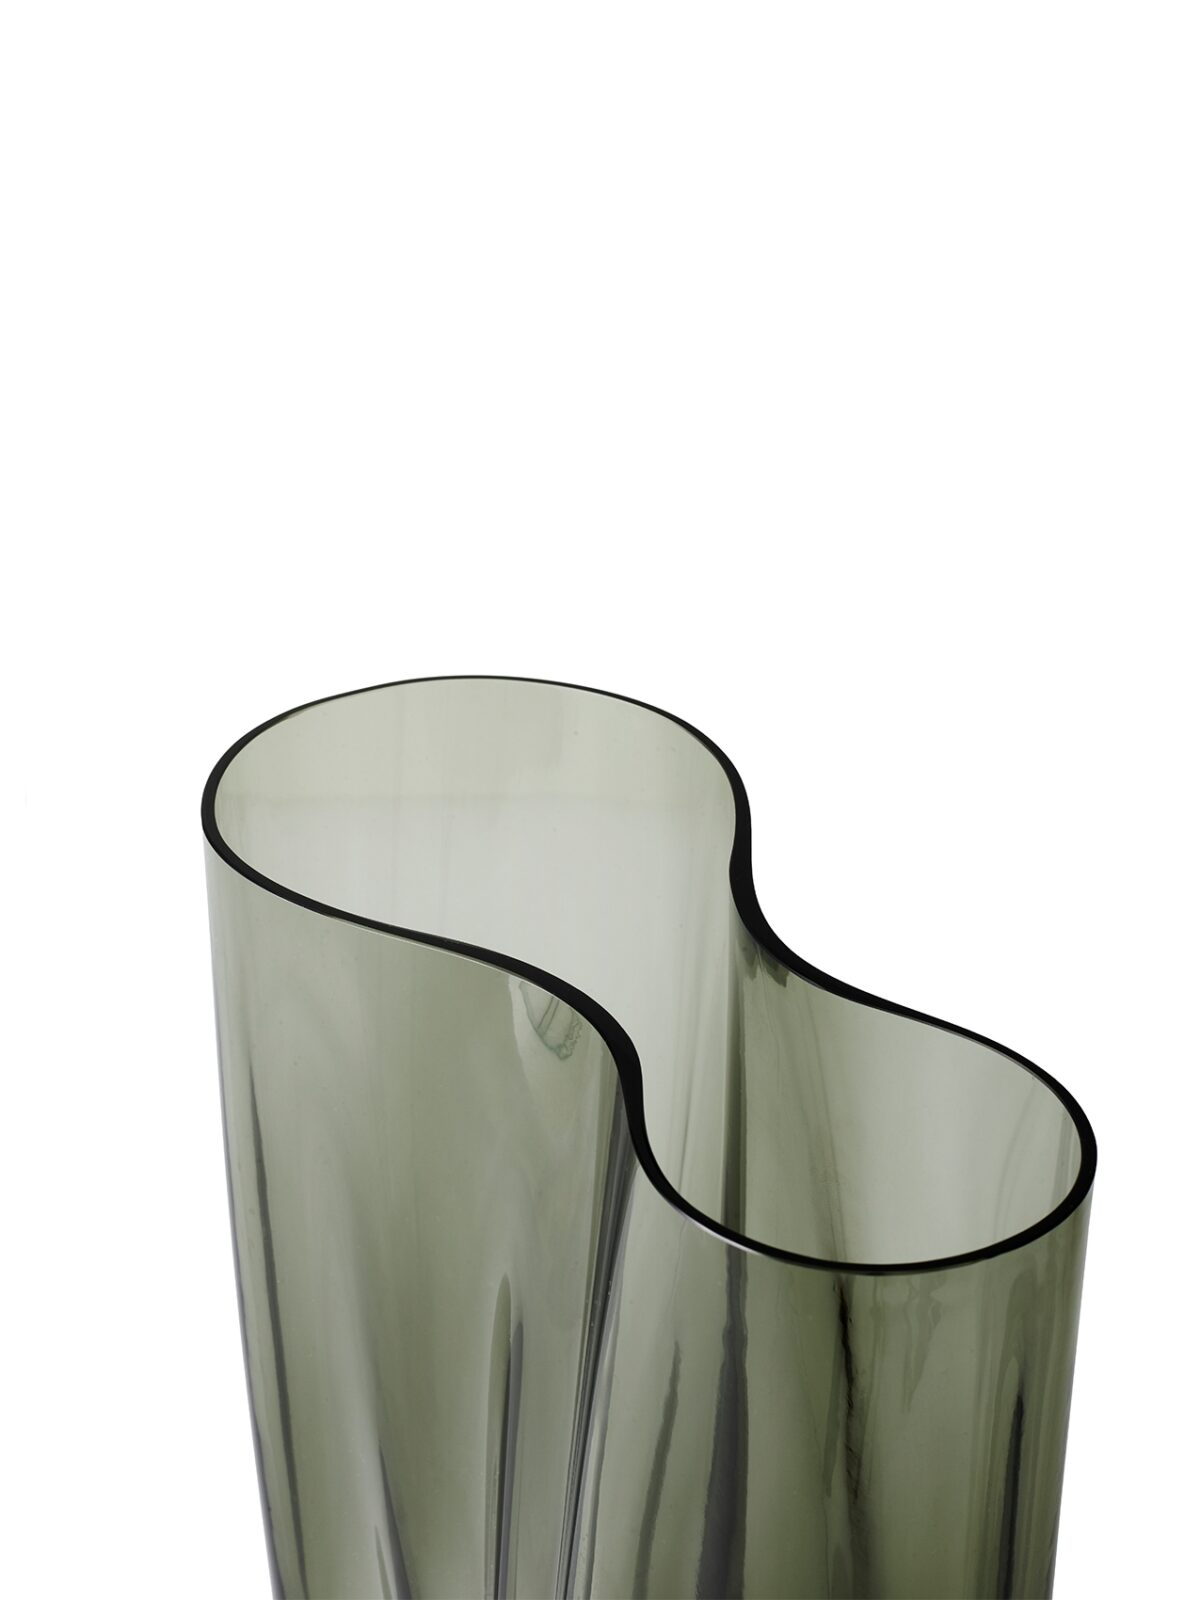 4736949 Aer Vase Small 33 01 3